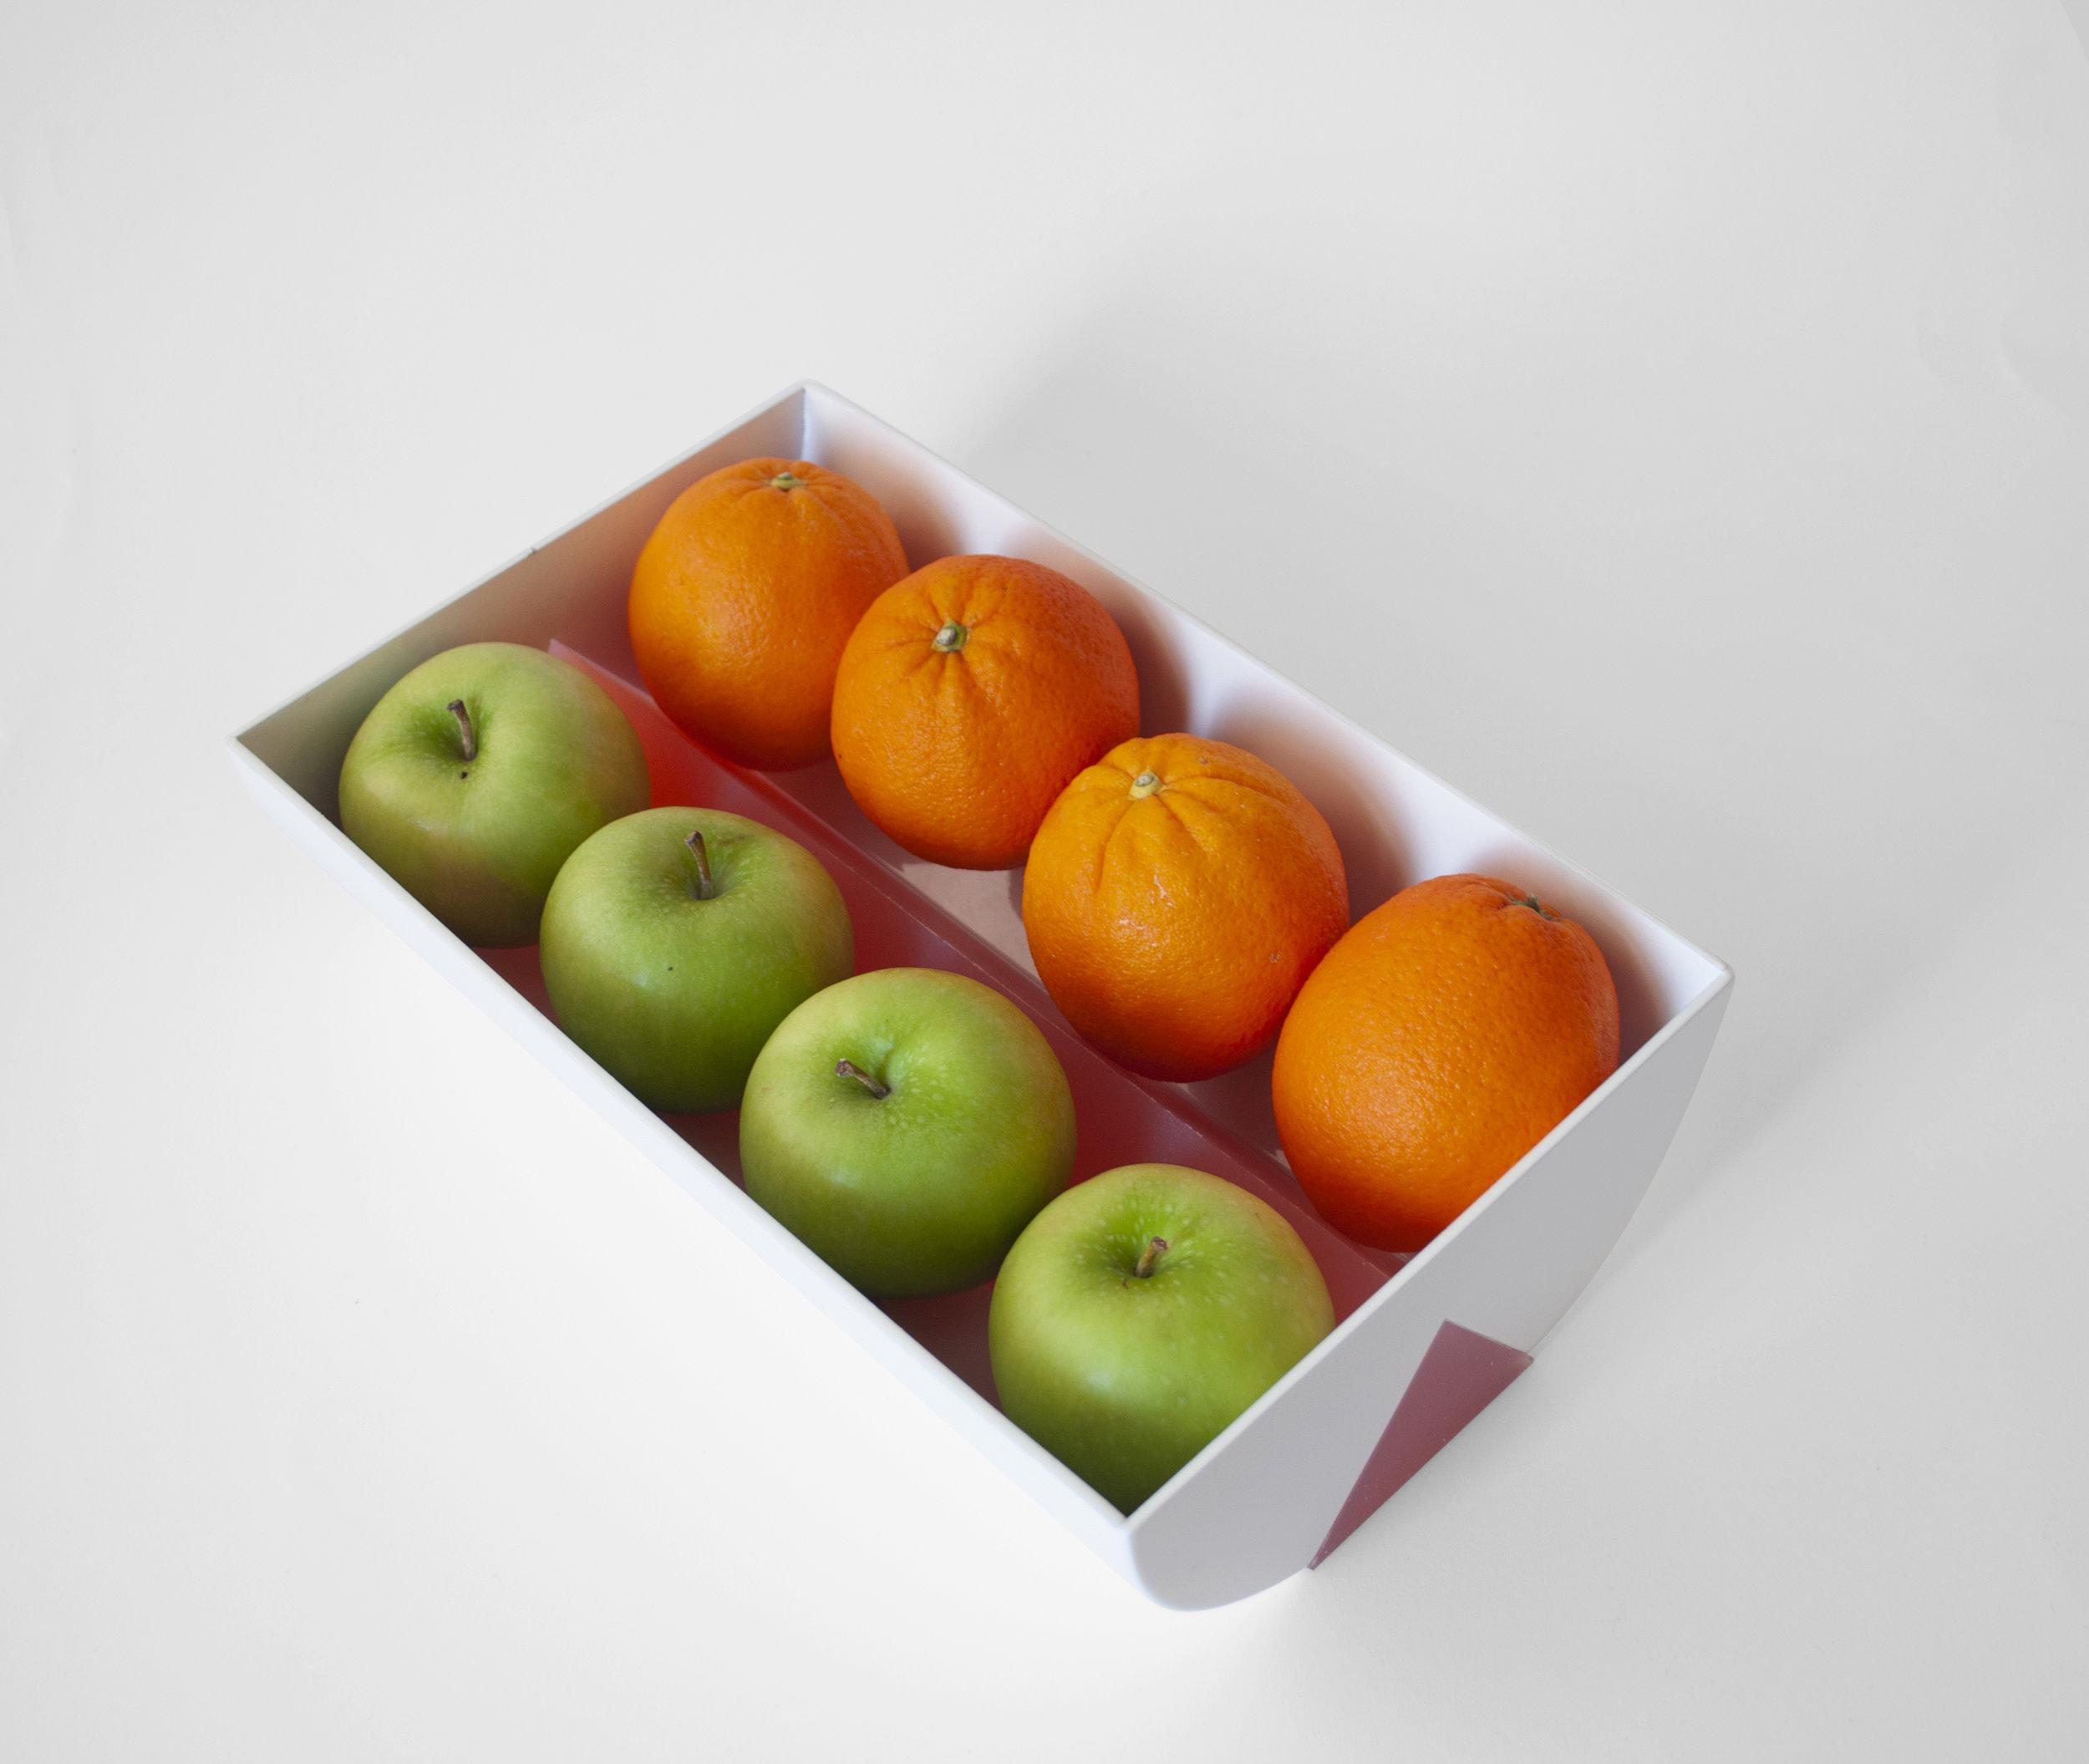 fruit bowl photo 1.jpg